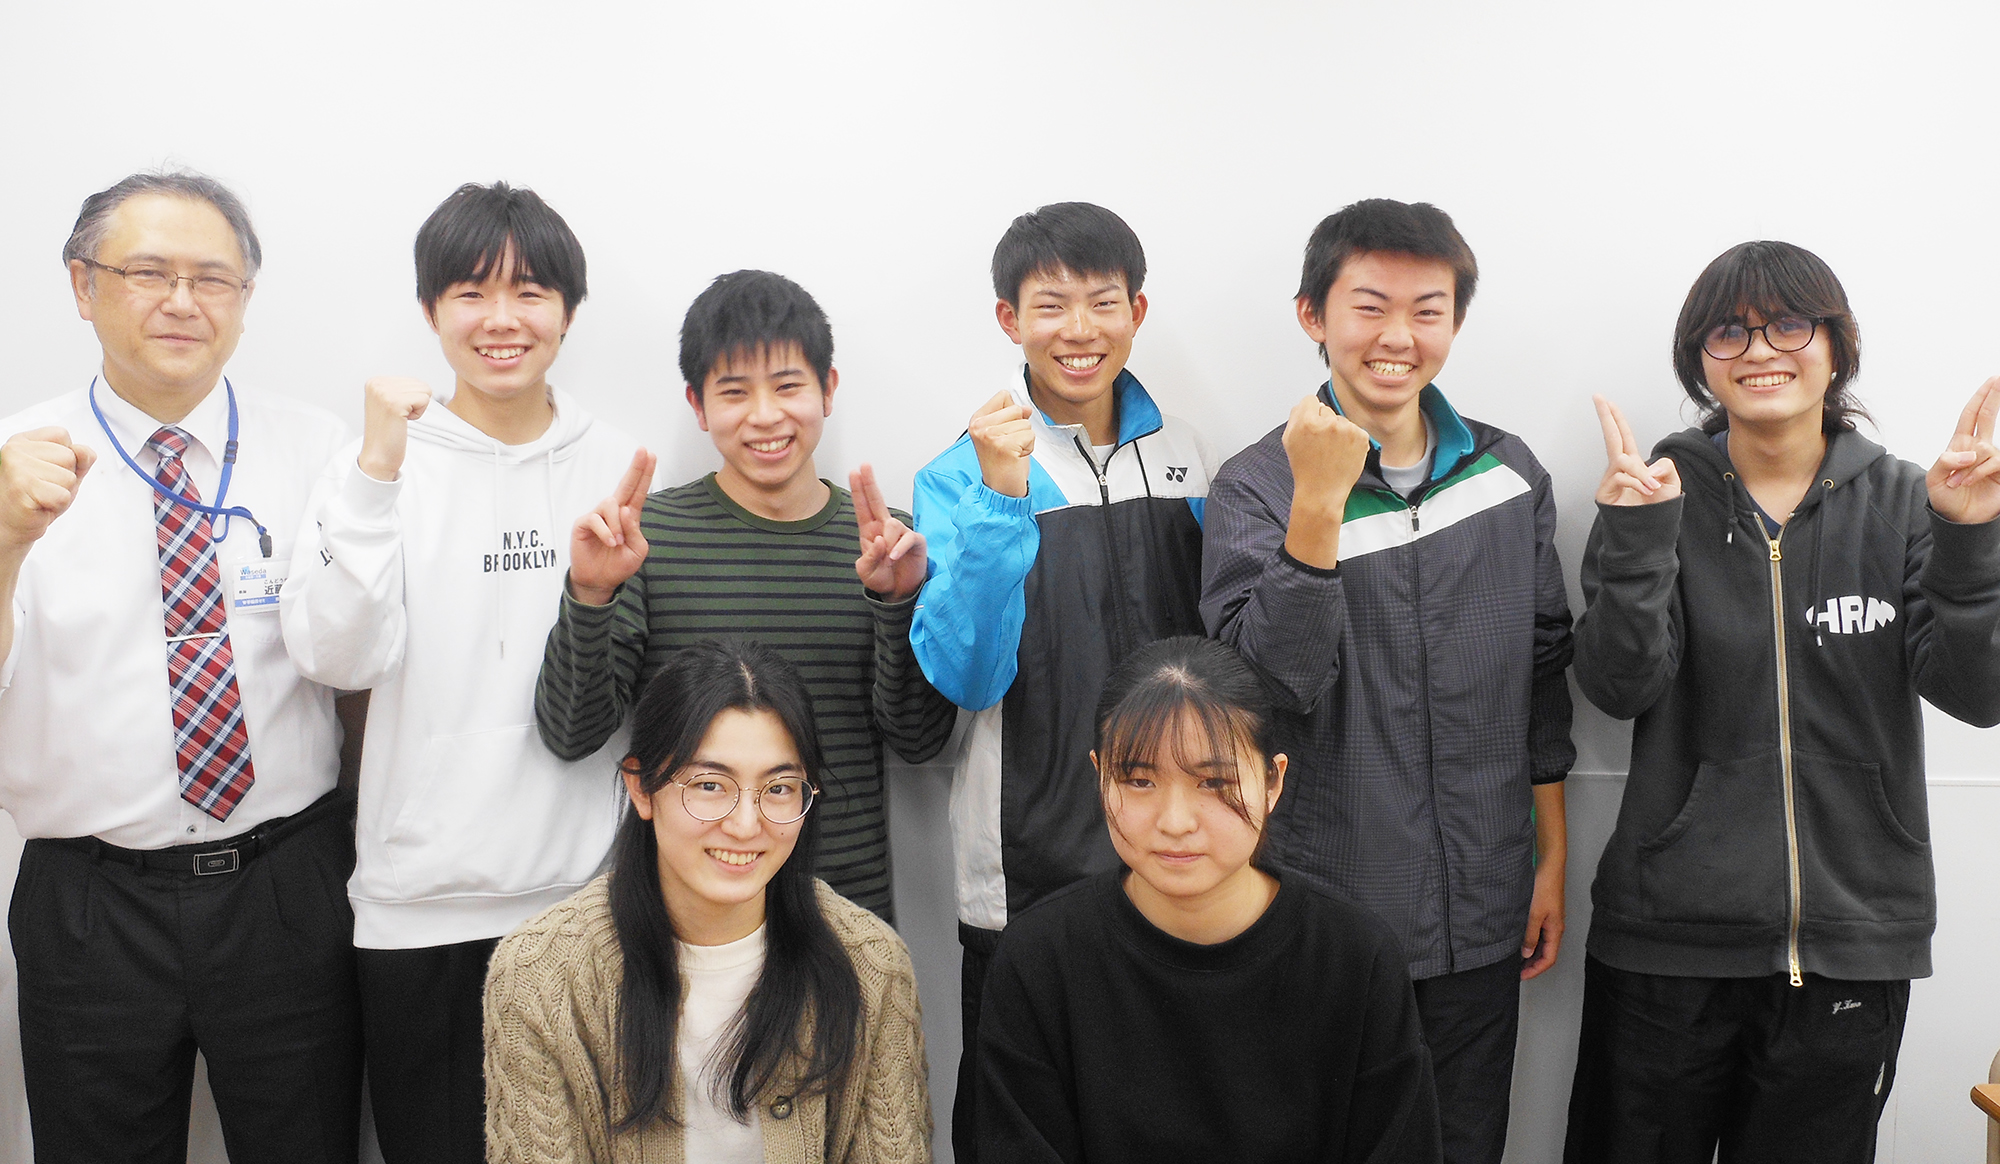 W早稲田ゼミ 熊谷ハイスクール